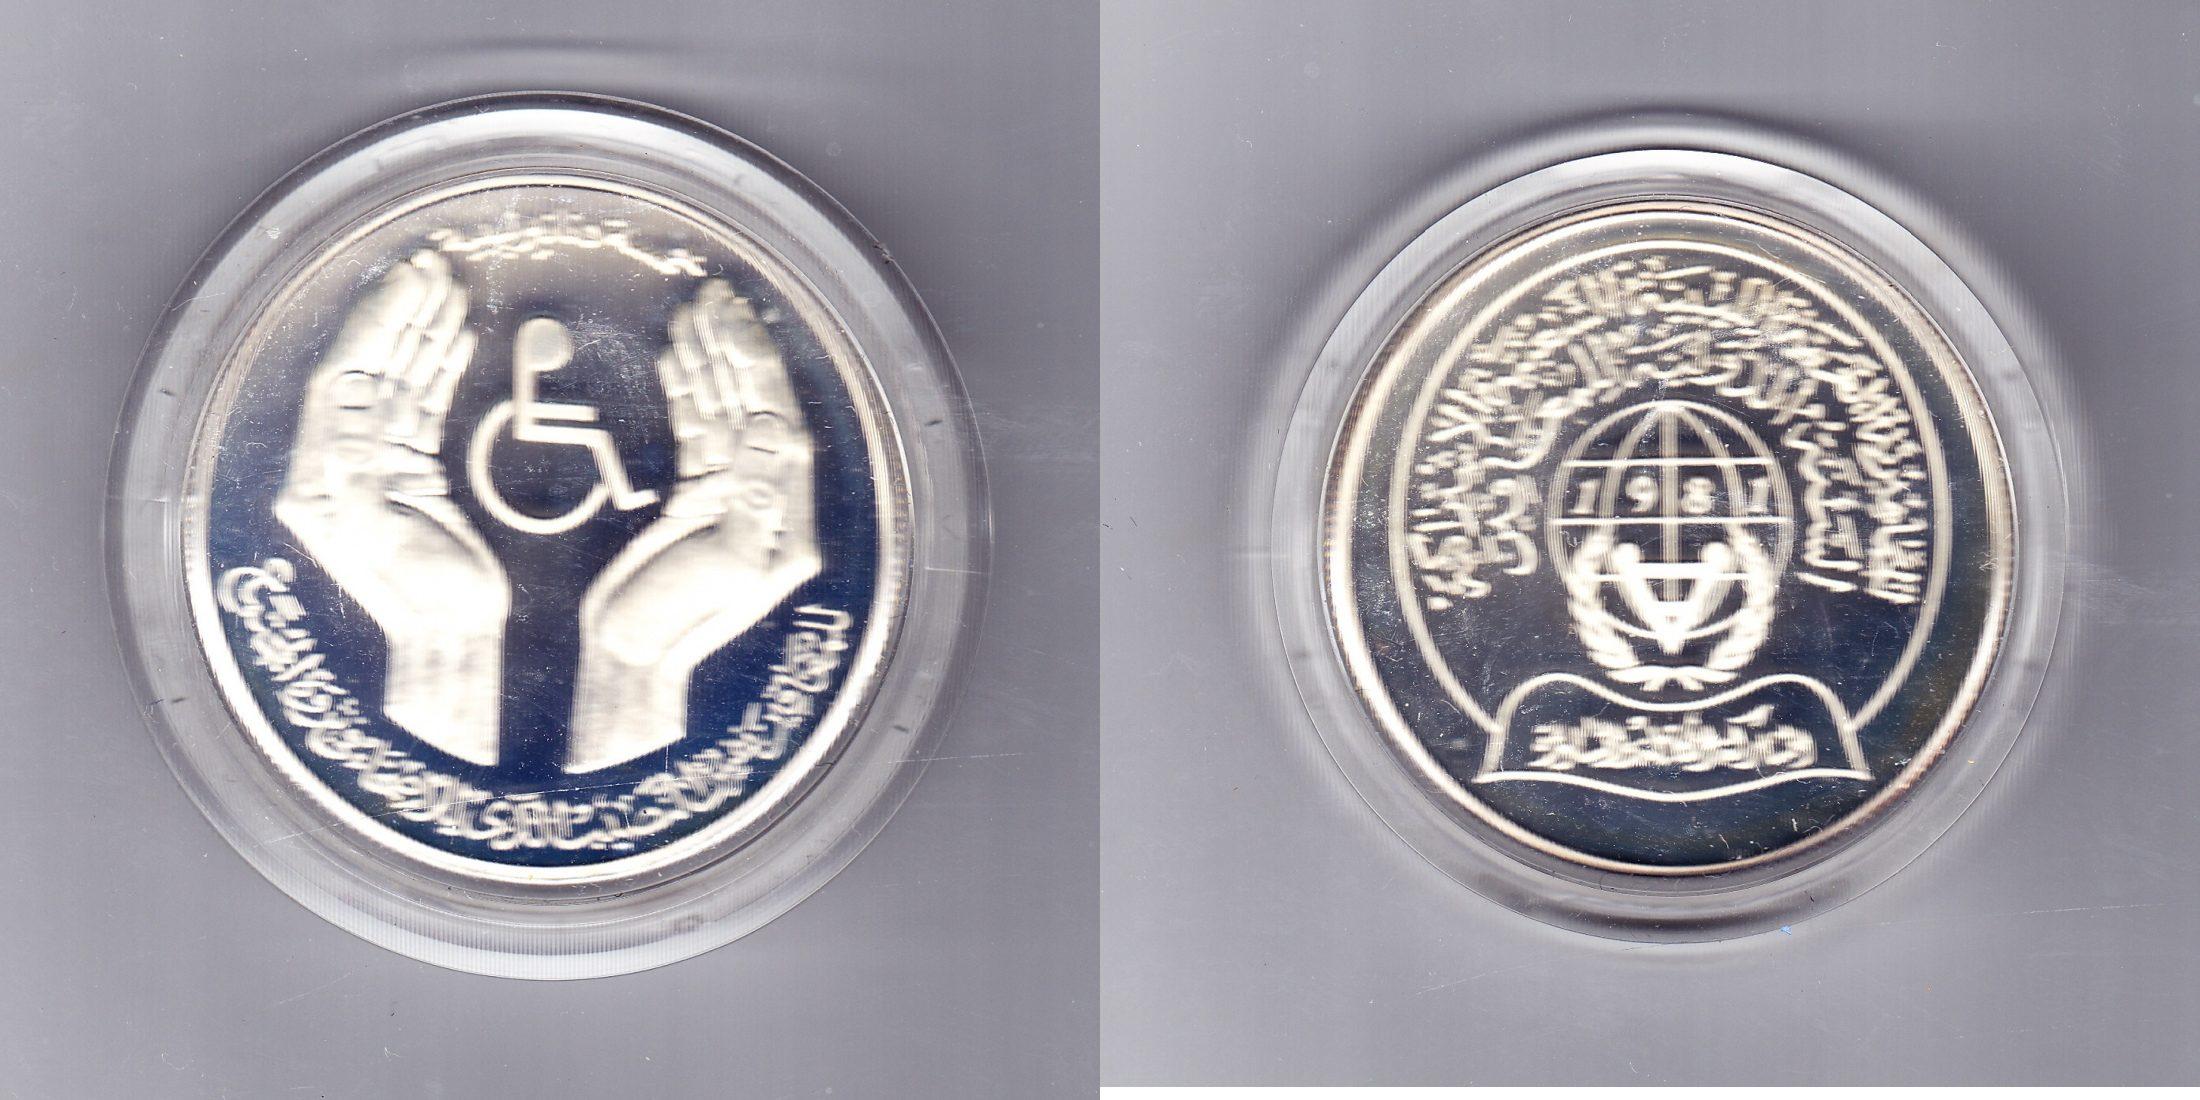 Libyen 5 Dinar 1981 Jahr der Behinderten proof